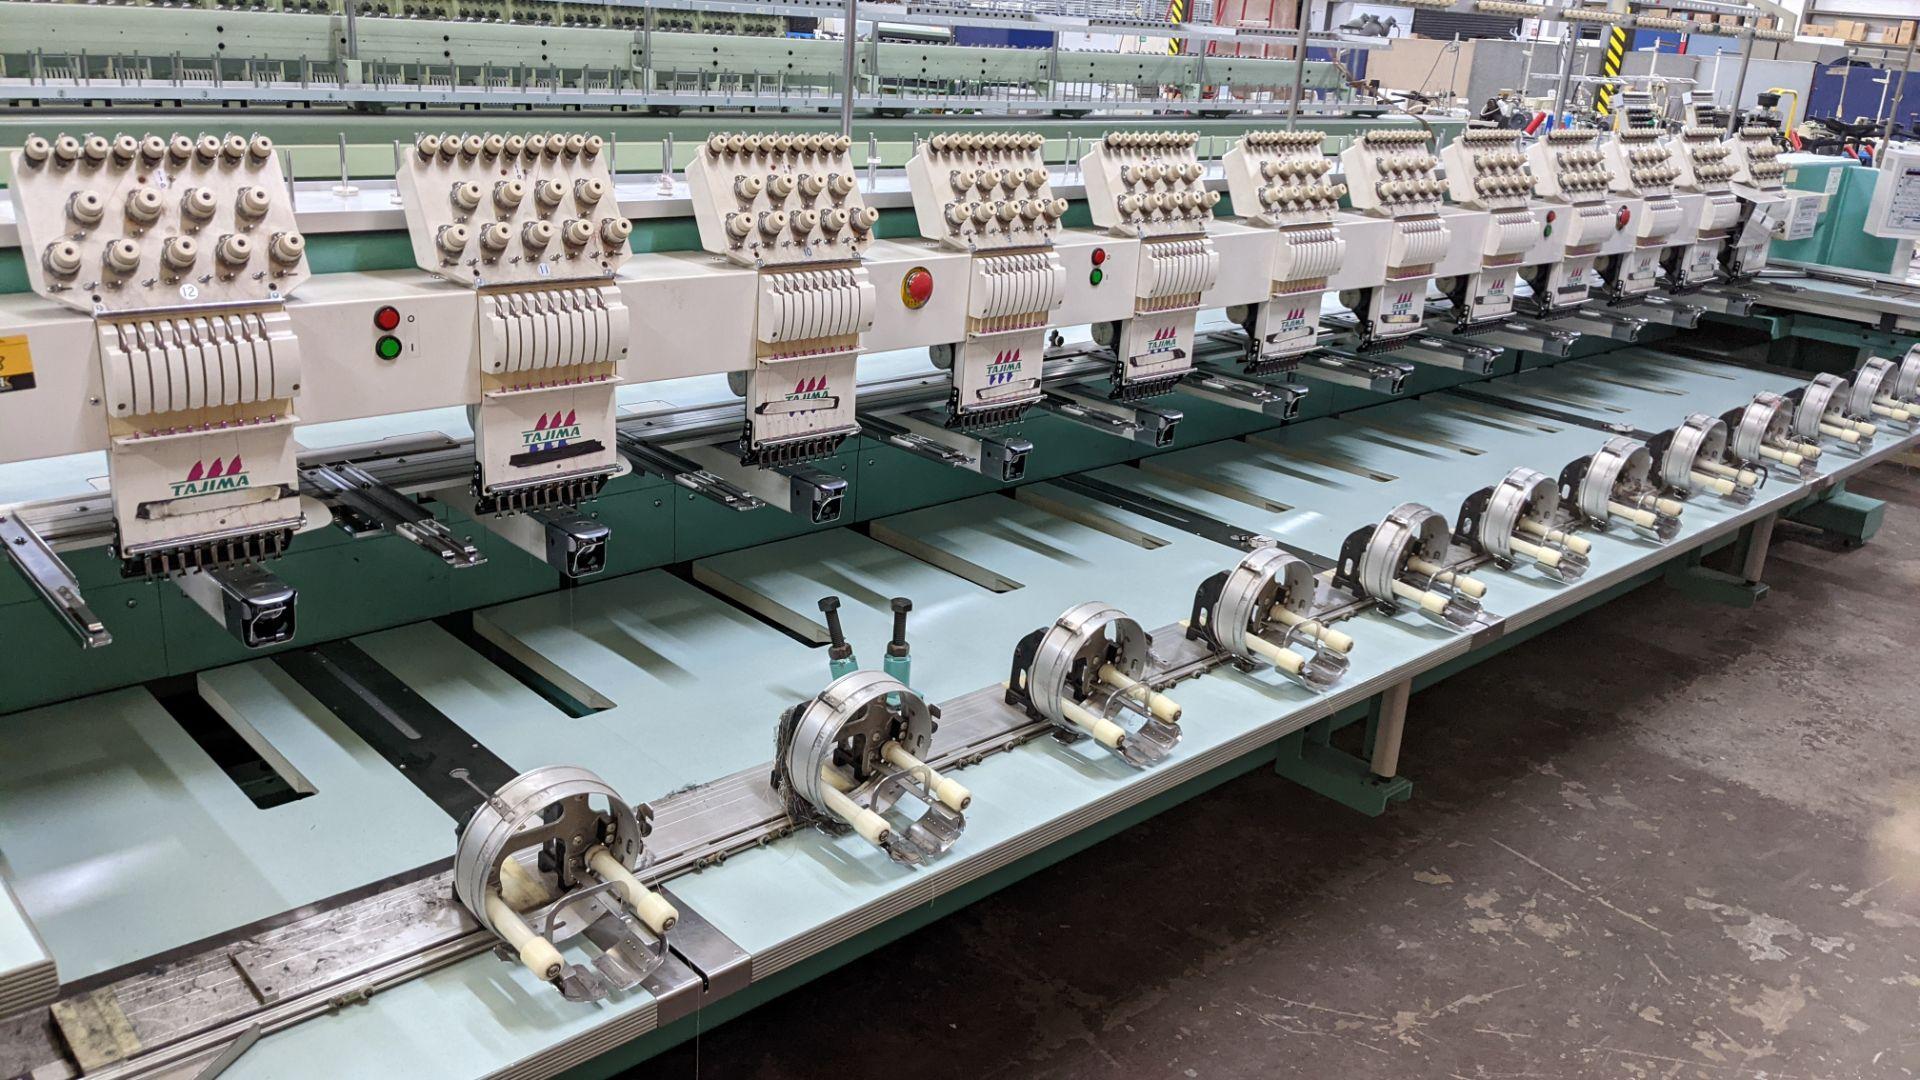 Tokai Tajima model TMFD-C912 electronic 12 head embroidery machine, type 2-2FX - Image 4 of 27